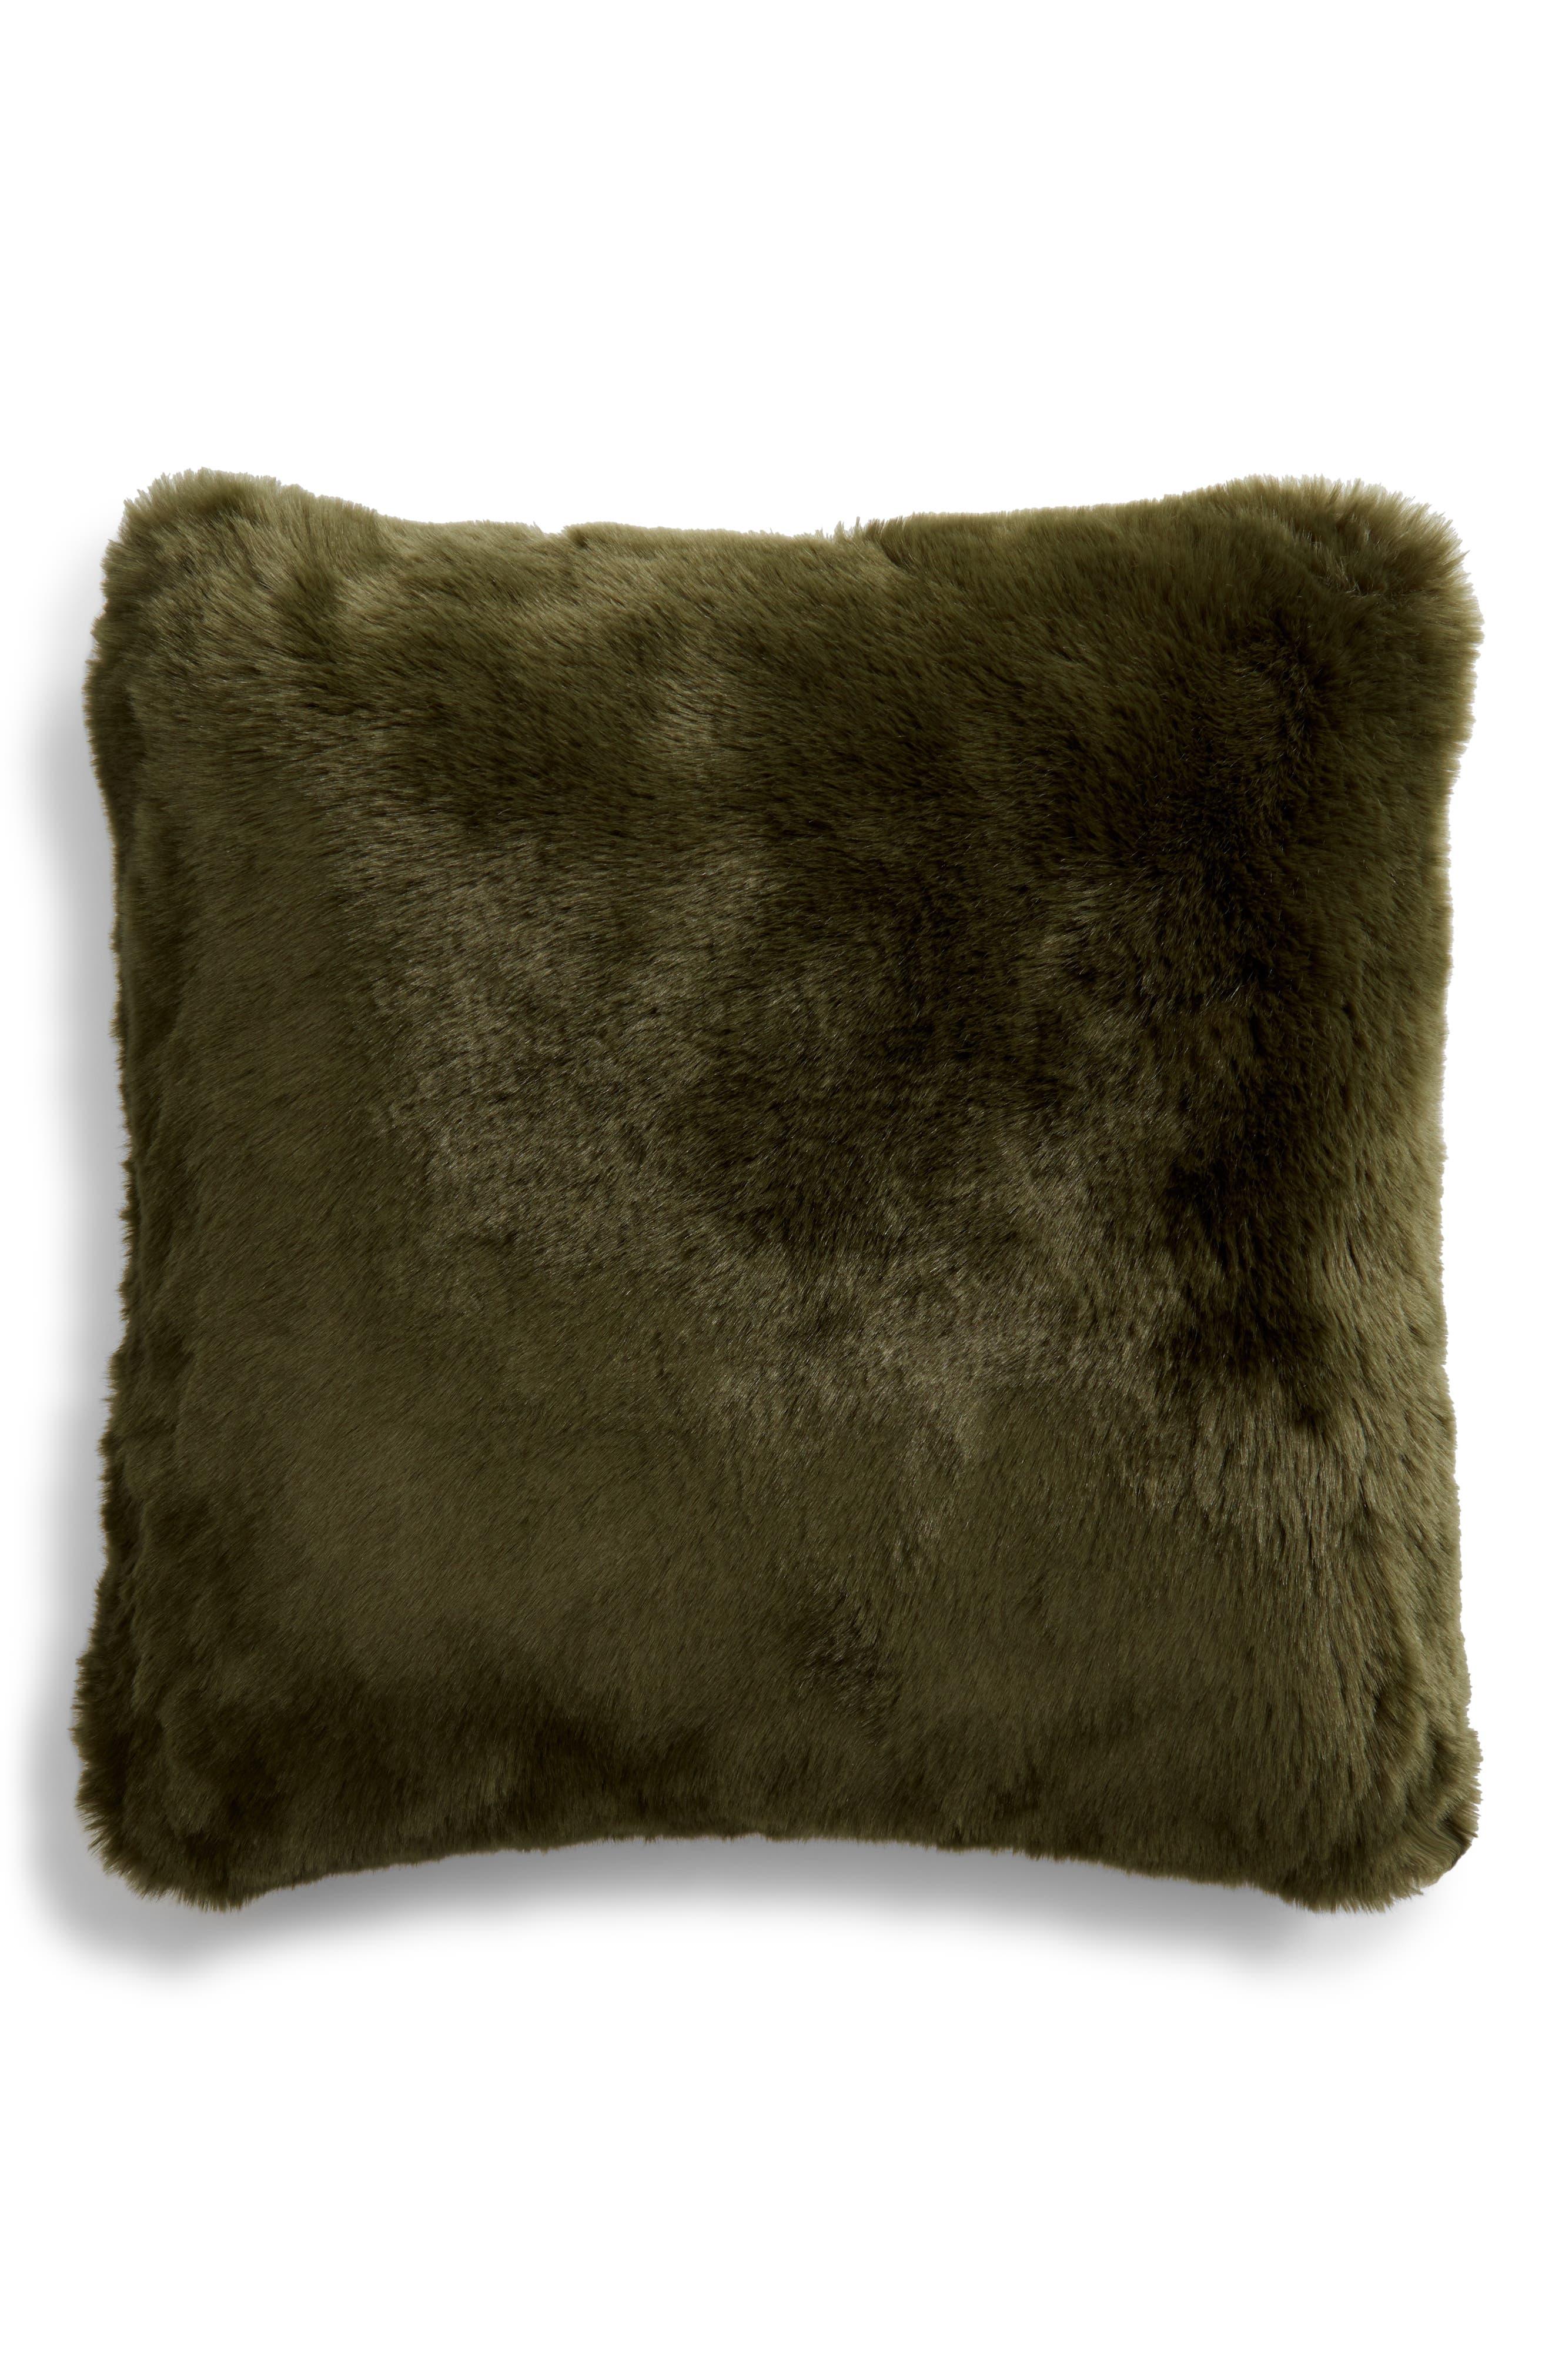 Cuddle Up Faux Fur Pillow,                             Main thumbnail 1, color,                             Green Cypress